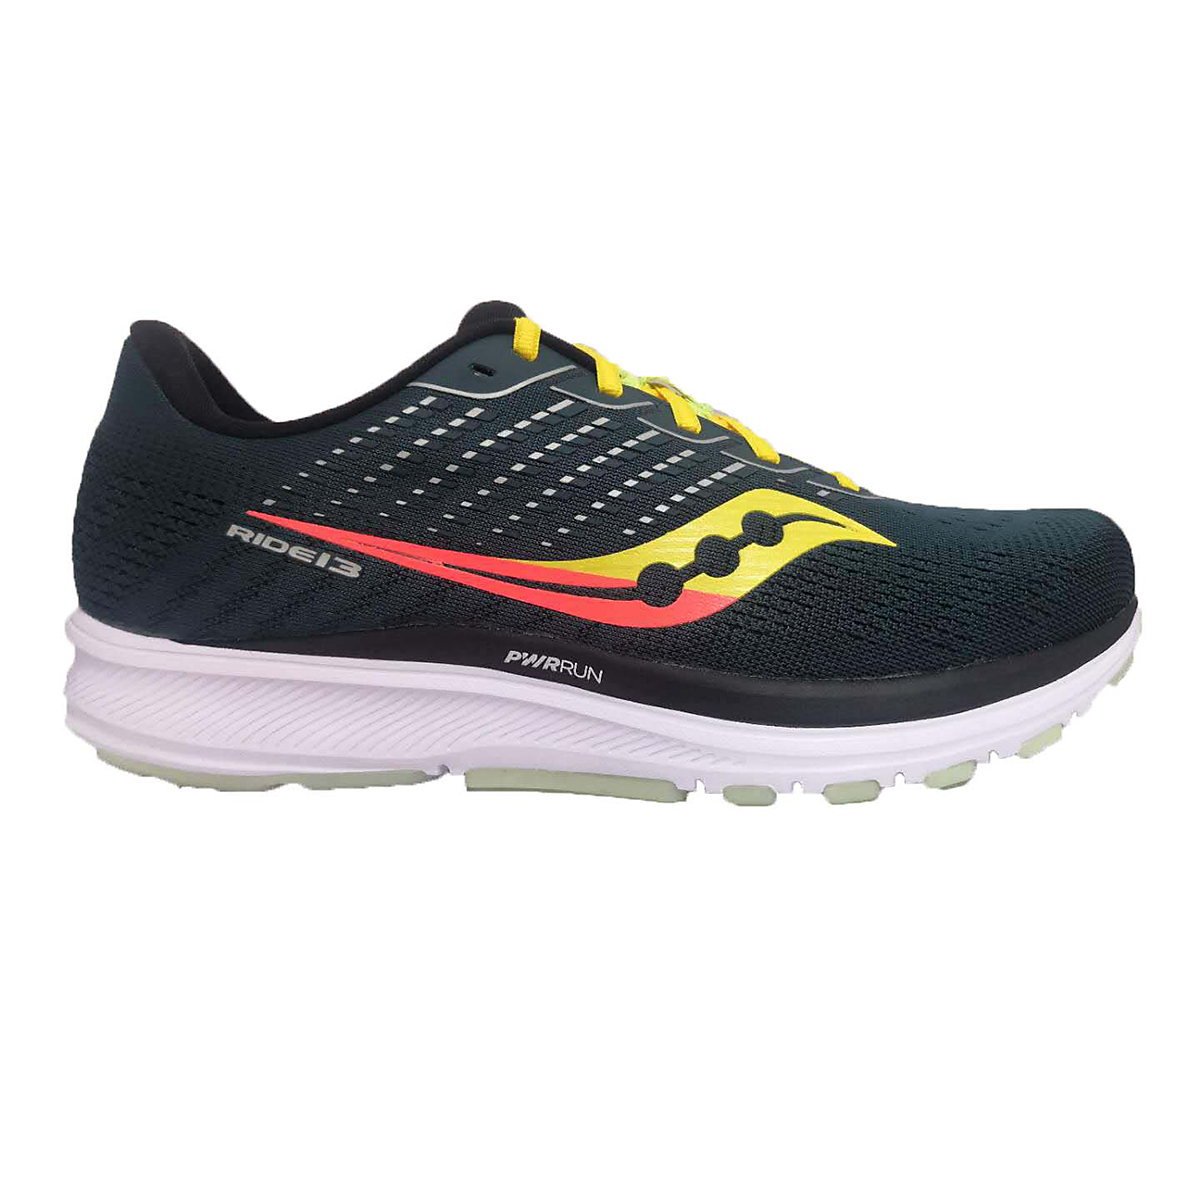 Men's Saucony Ride 13 Running Shoe, , large, image 1